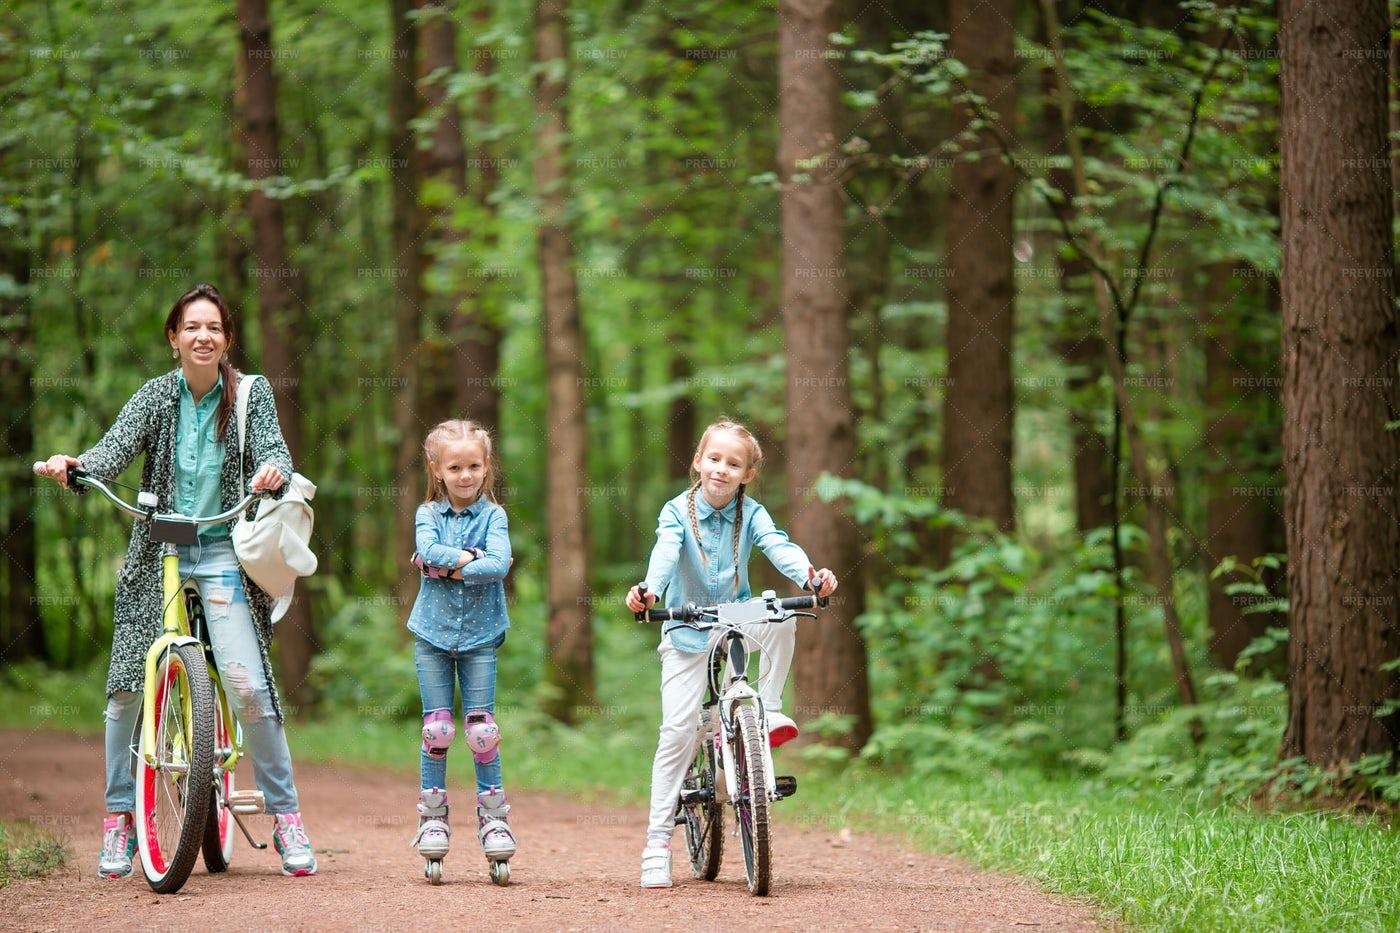 Family Riding Bicycle: Stock Photos